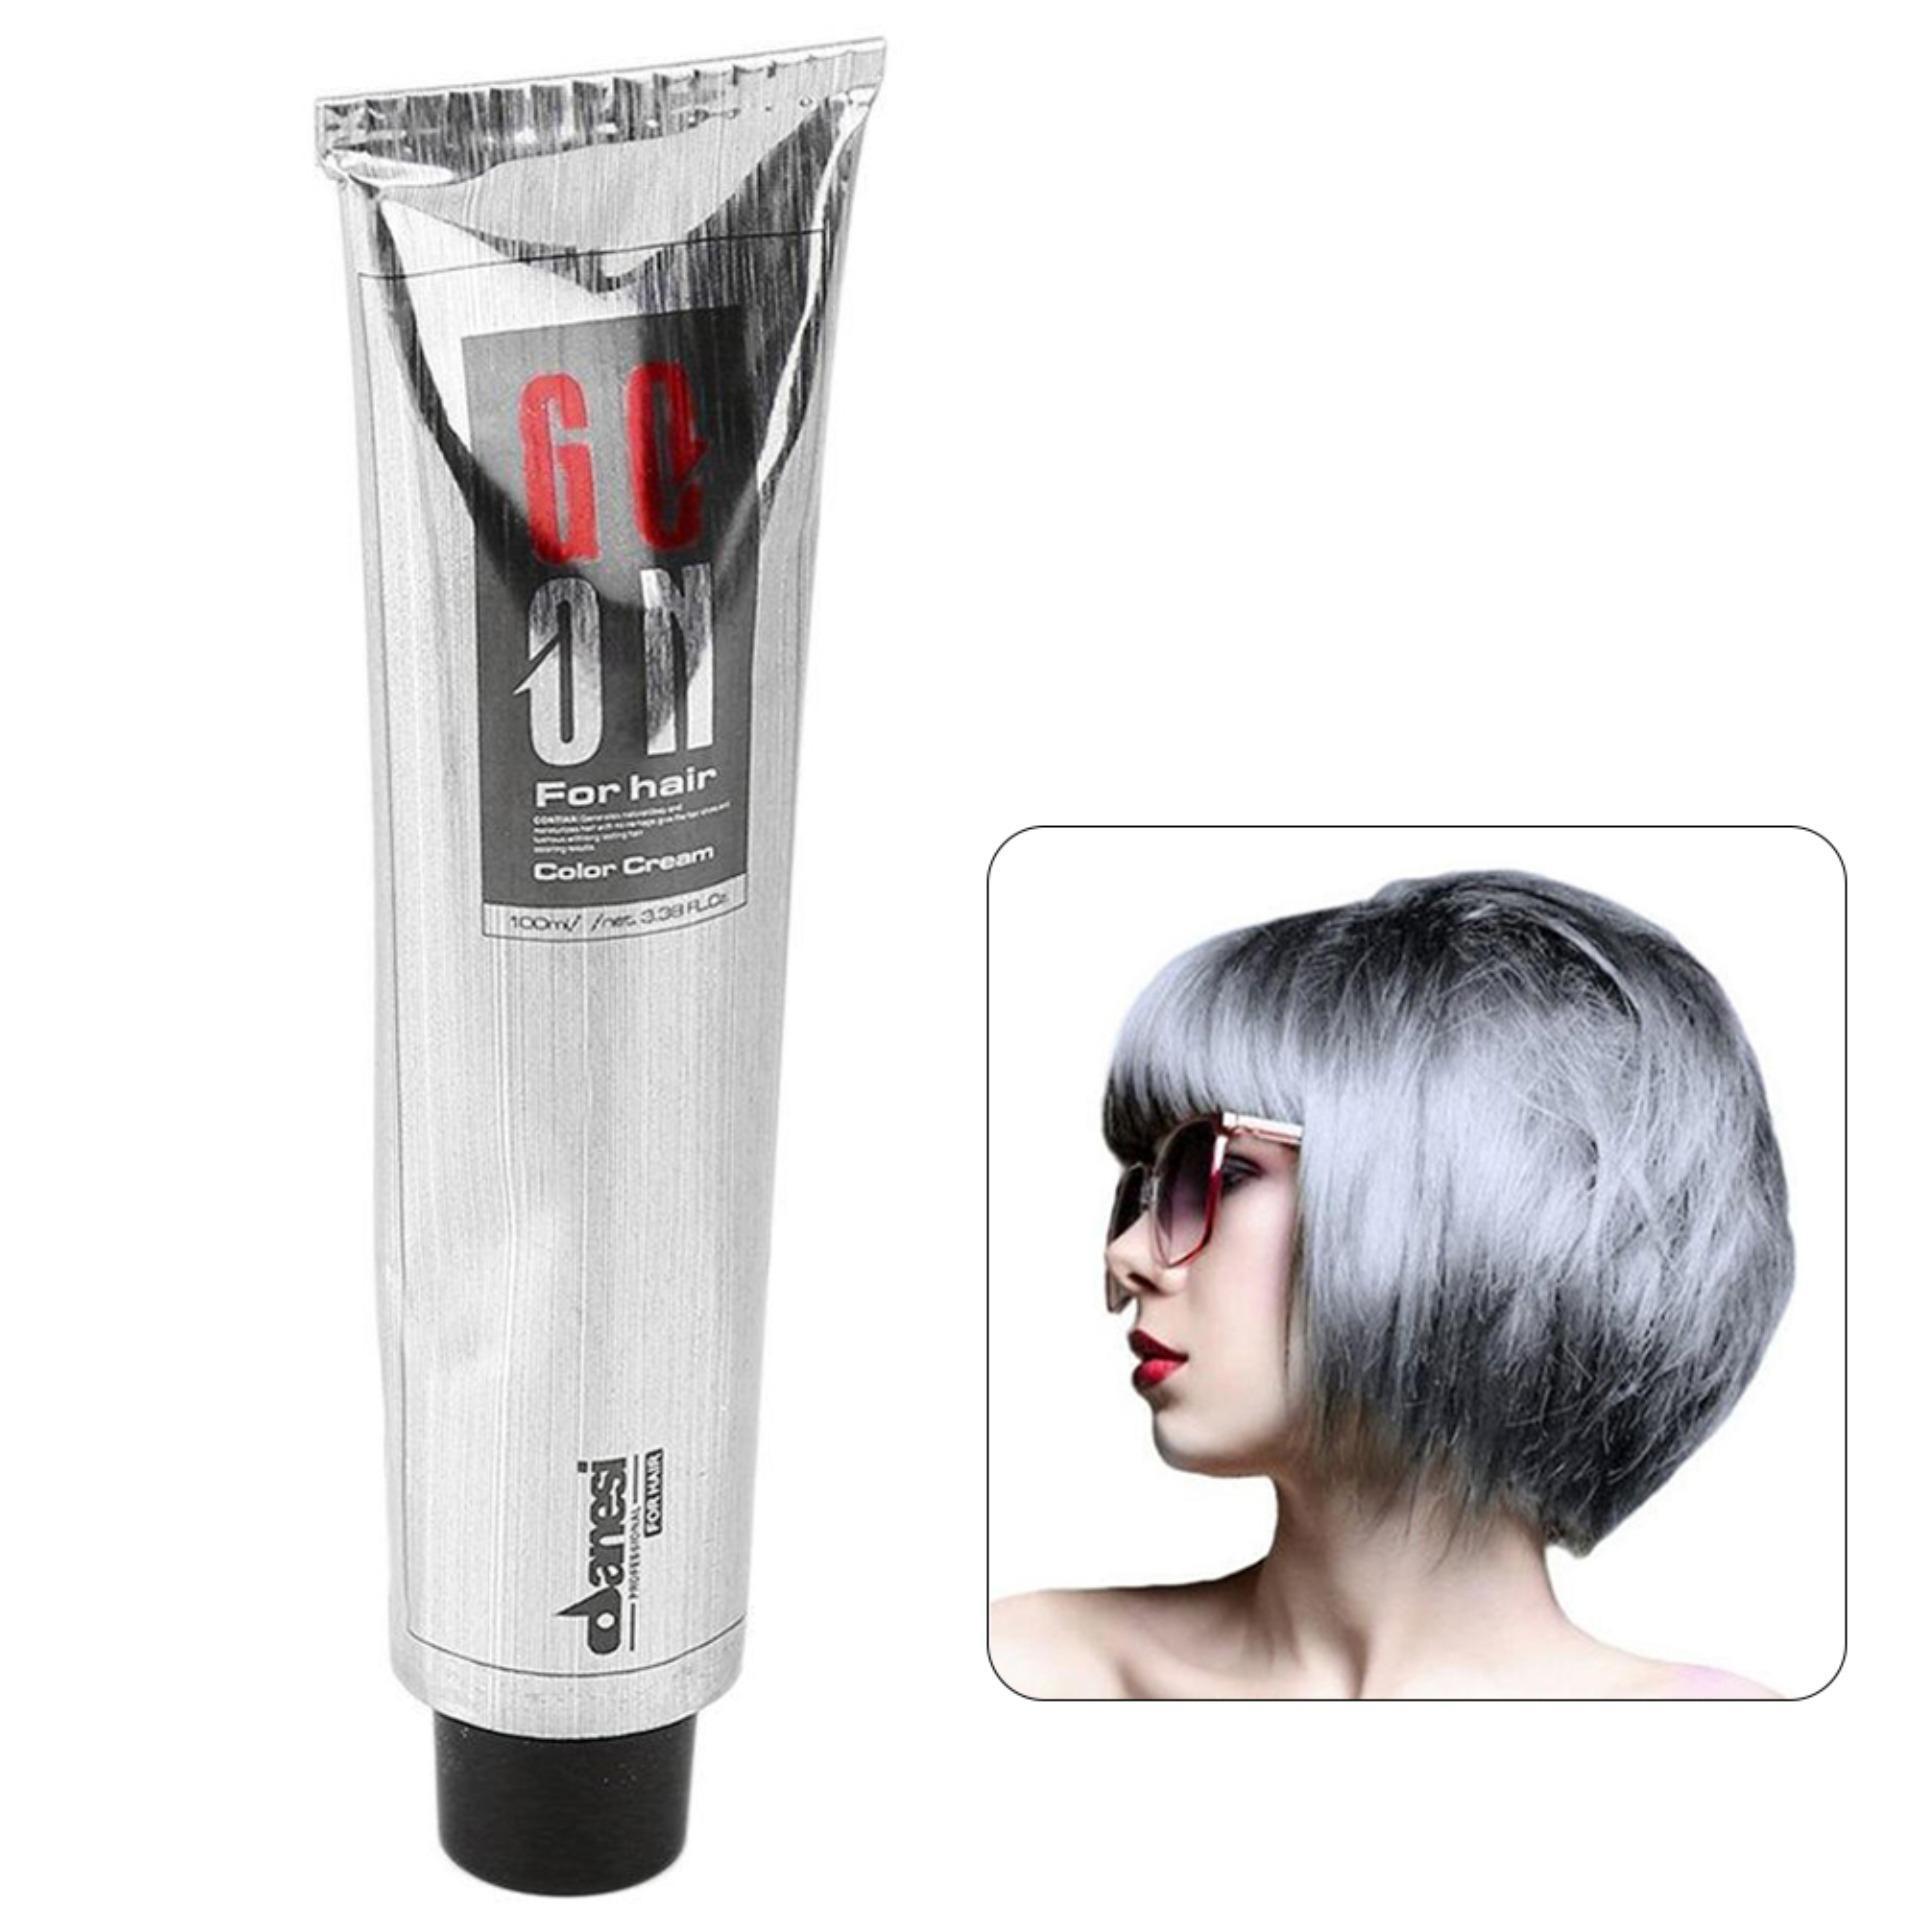 Buy Sell Cheapest 100 Ml Pro Best Quality Product Deals Cussons Baby Hair Lotion Avocado Ampamp Vit B Abu Muda Warna Rambut Pewarna Alami Krim Pencelupan Tidak Beracun